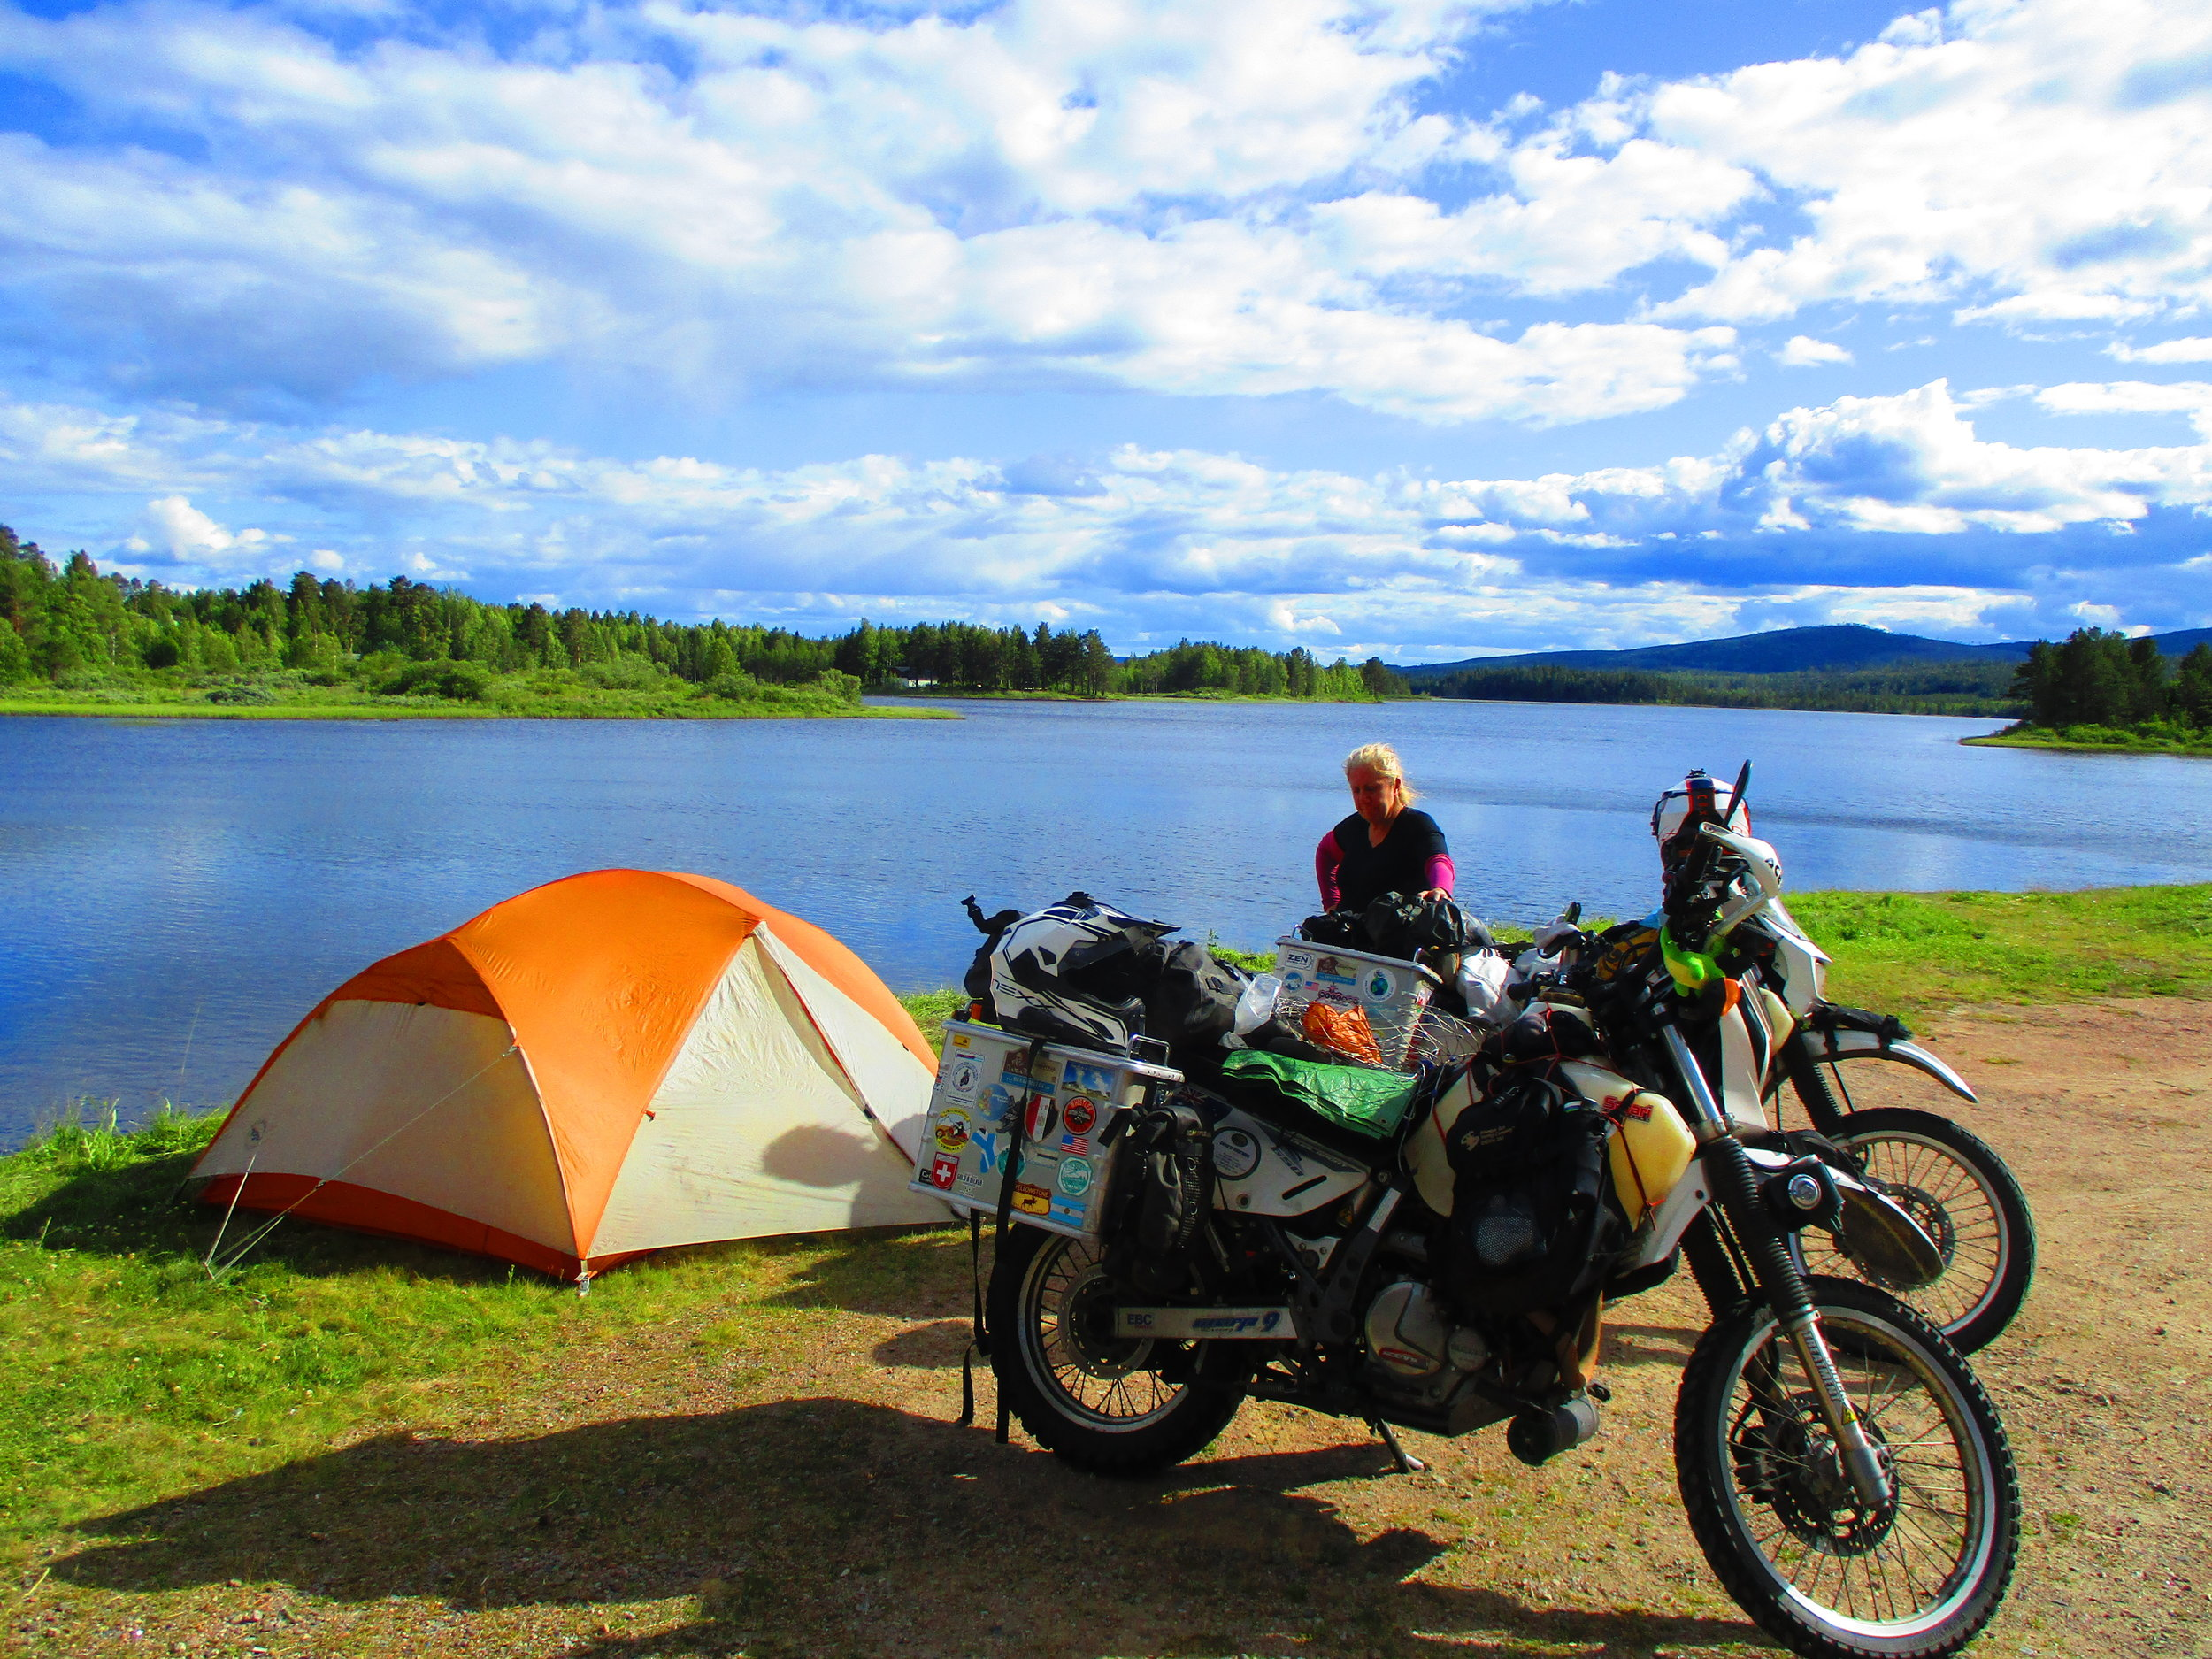 Free camping in Ytterhogdal, Sweden